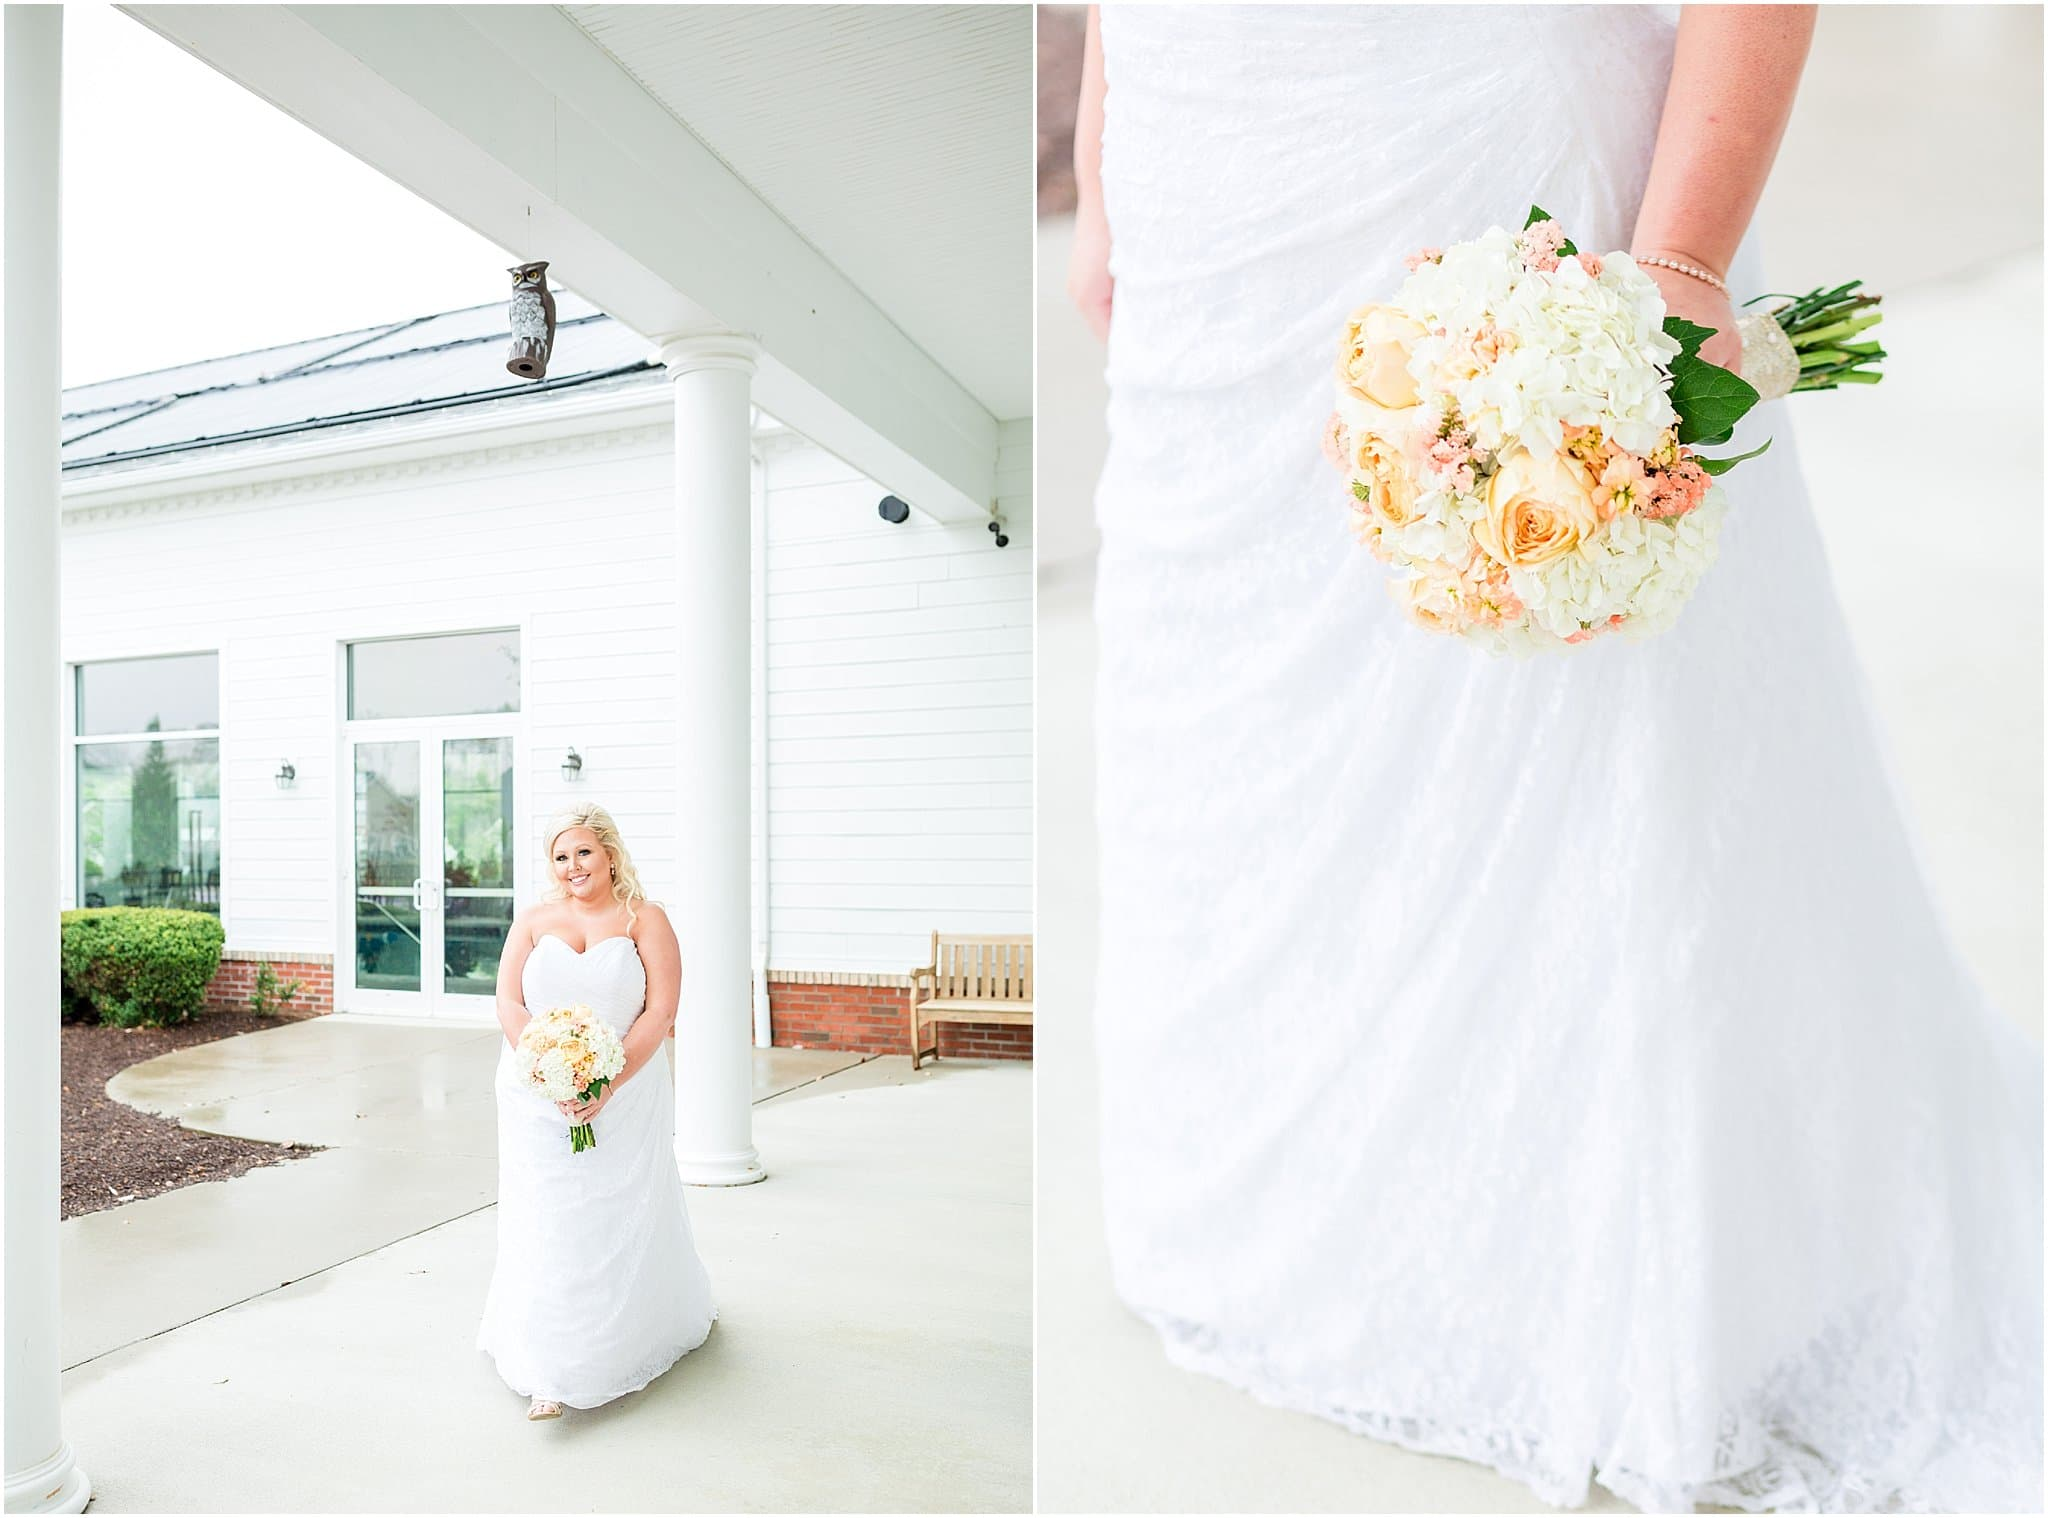 jessscott-milsboro-delaware-wedding-cassidymrphotography_0024